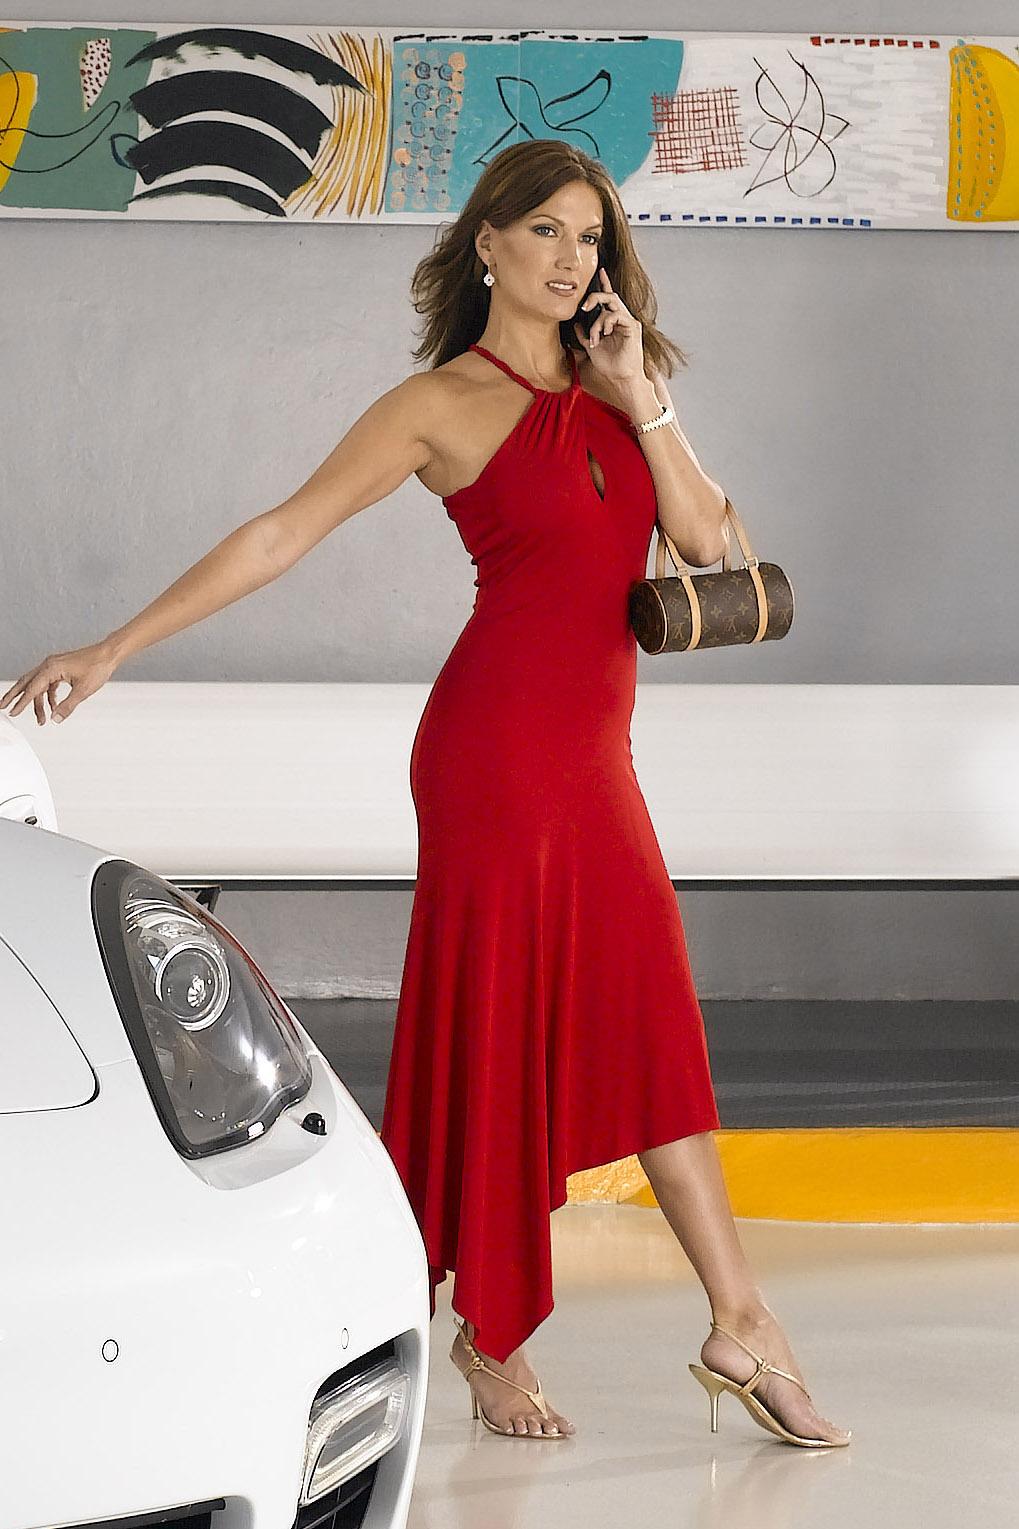 Deana Clark Model Champ